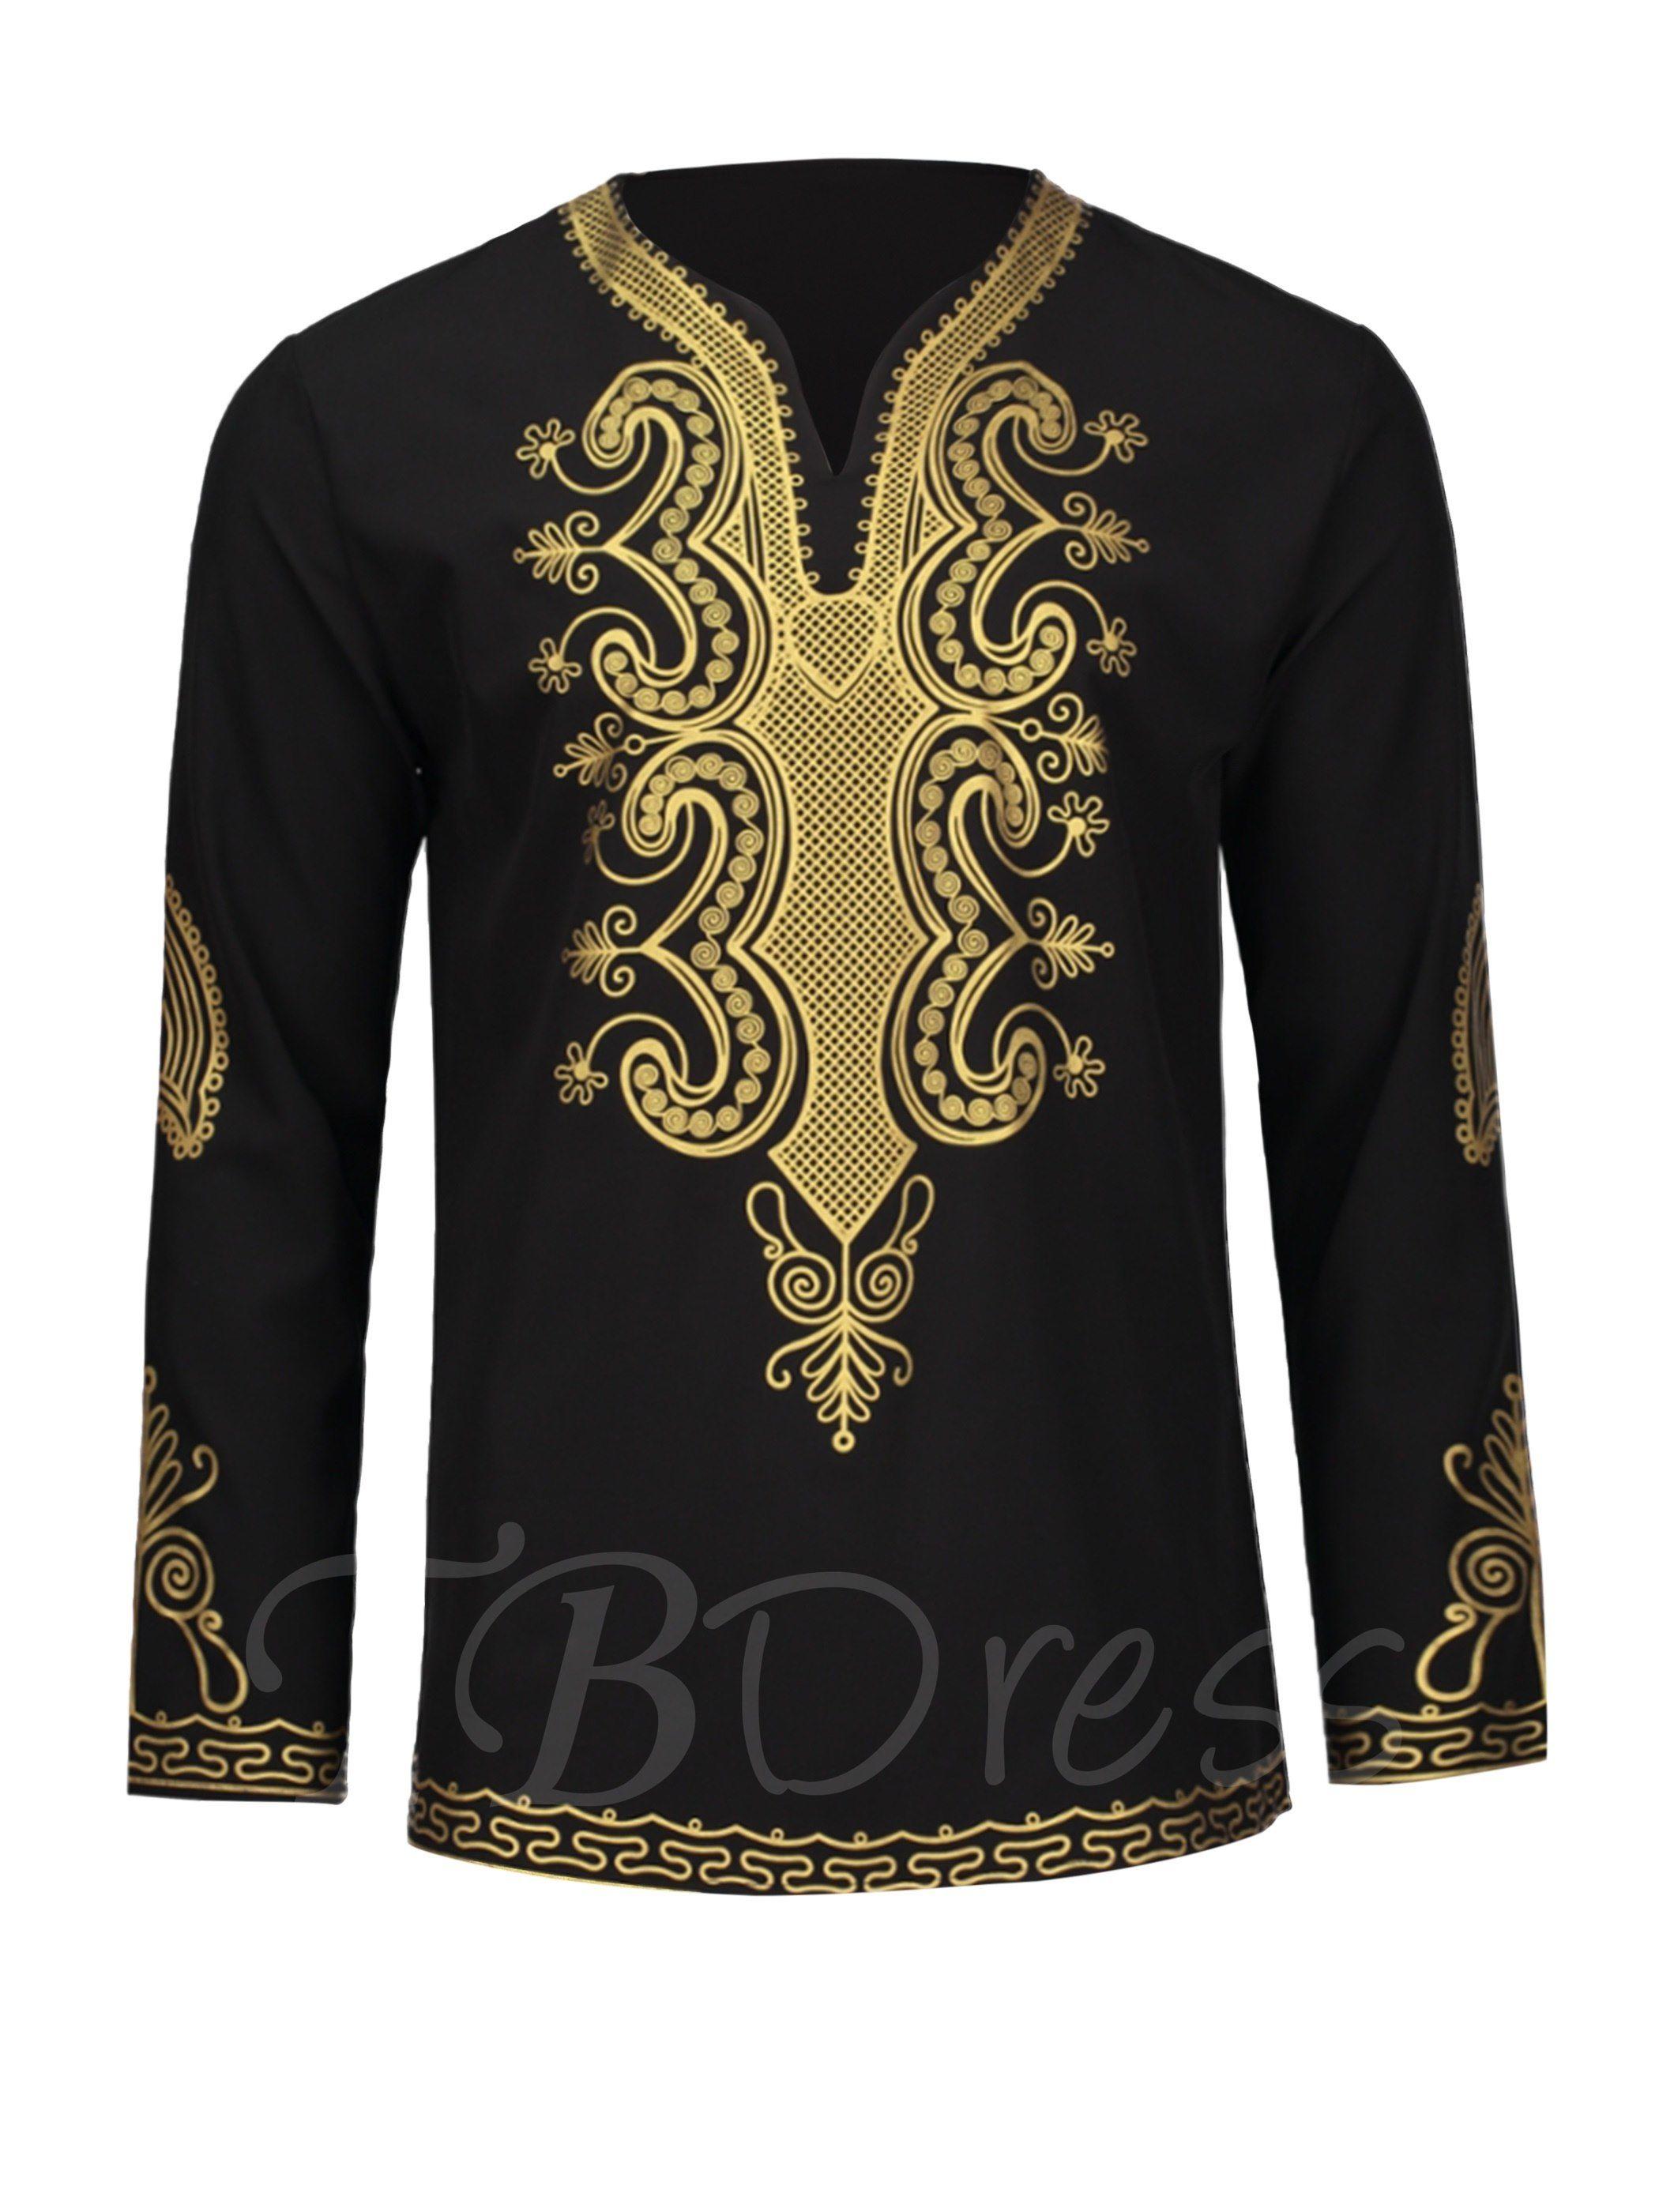 e16050785 Tbdress.com offers high quality Dashiki V-Neck Golden African Ethnic Printed  Slim Fit Men's Luxury Shirt Men's Shirts unit price of $ 24.99.